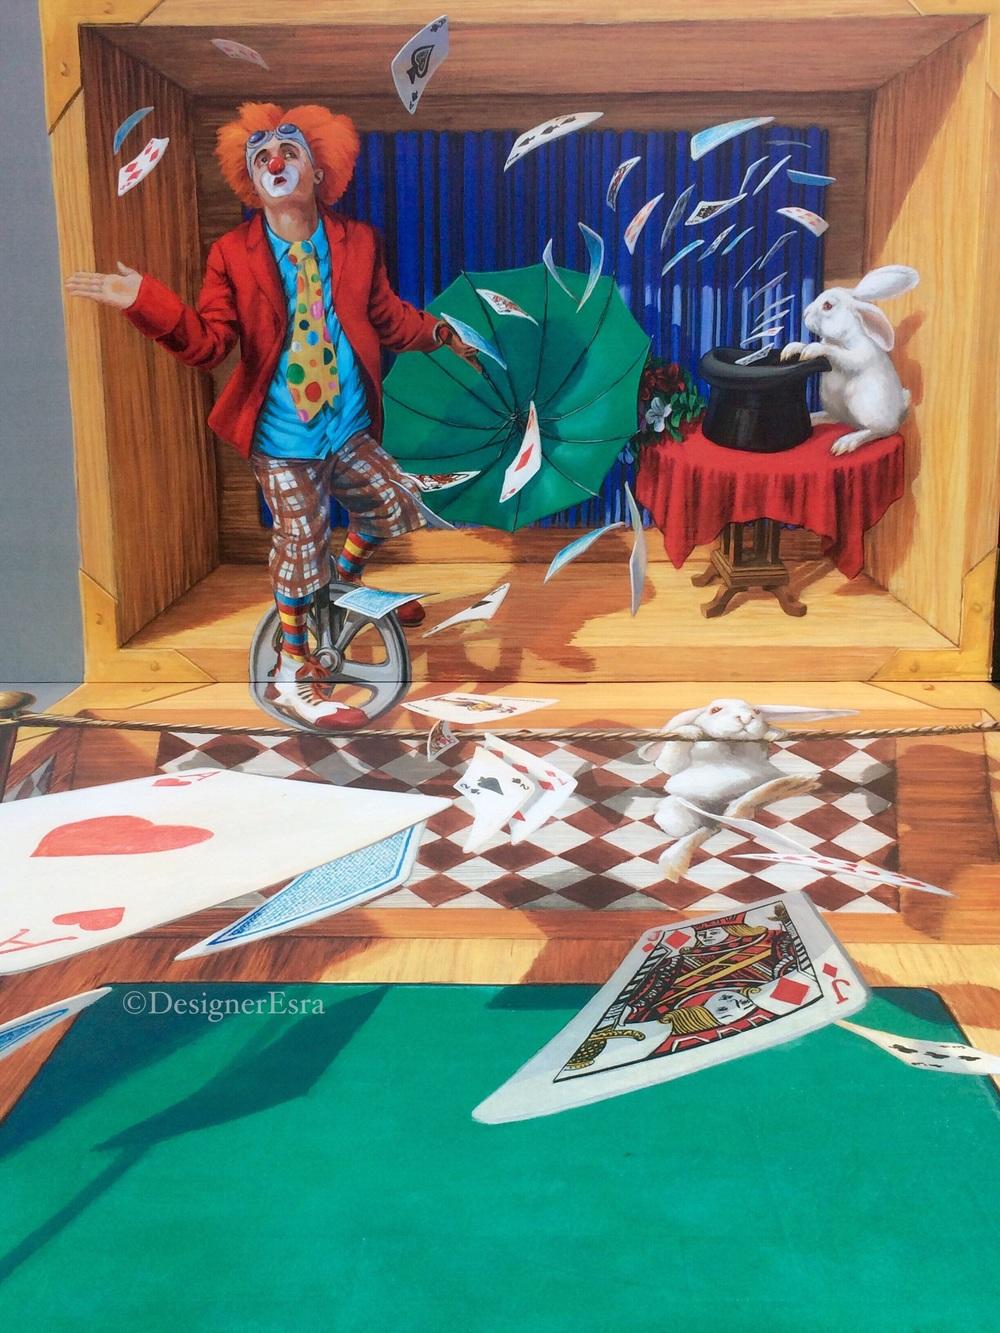 3D Circus Street Painting in Dubai